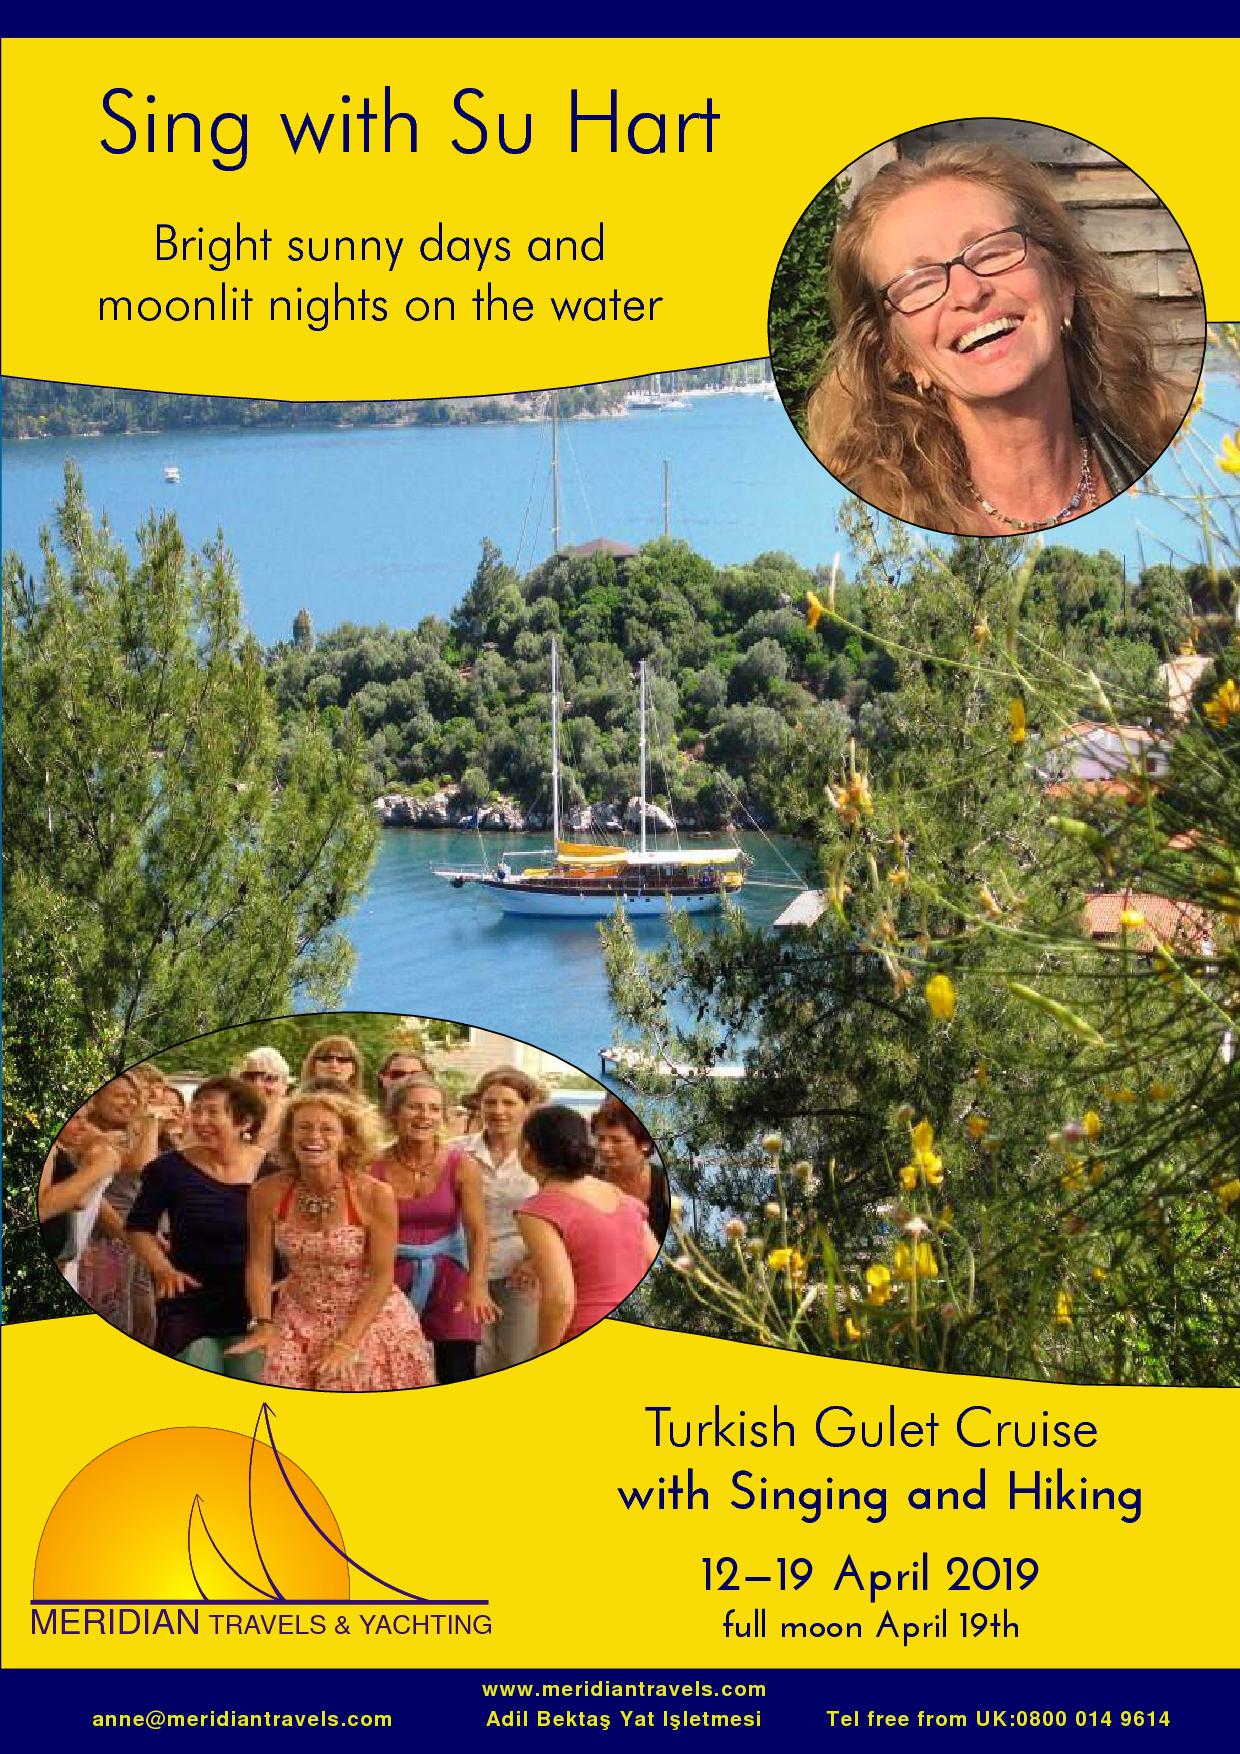 Su Hart Gulet Cruise April 2019